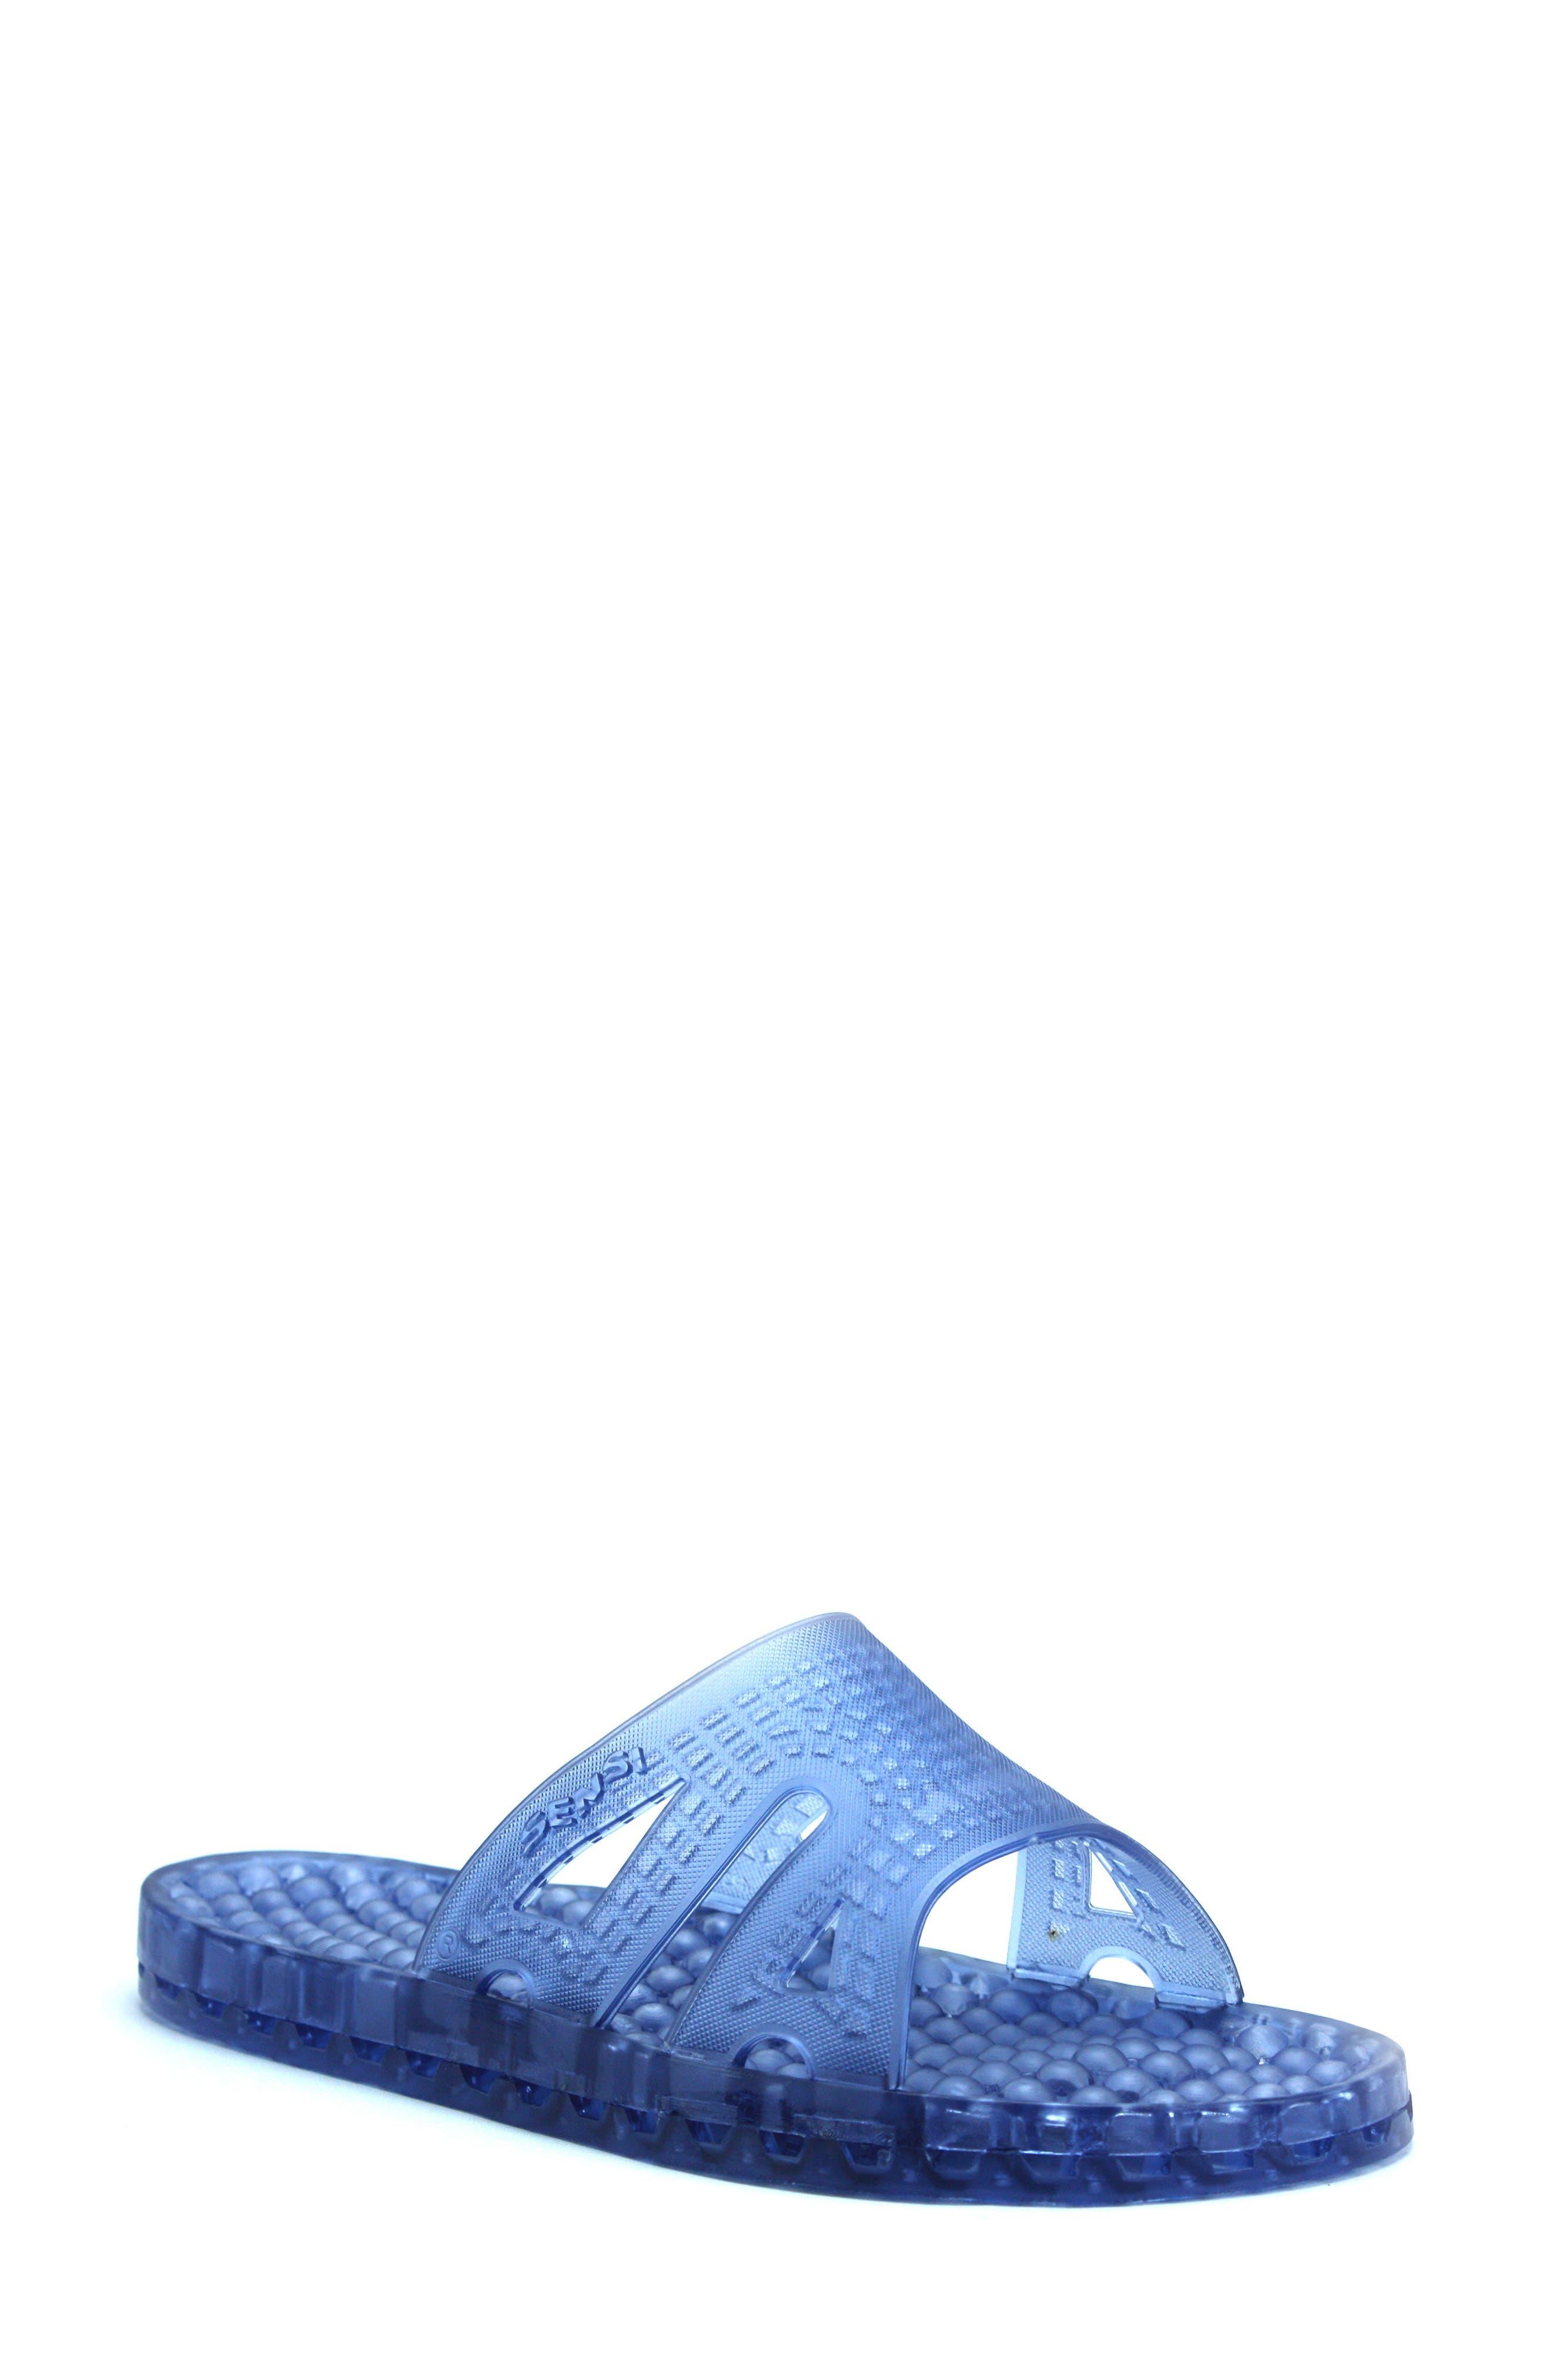 Regatta Ice Slide Sandal,                             Main thumbnail 1, color,                             Murano Rubber